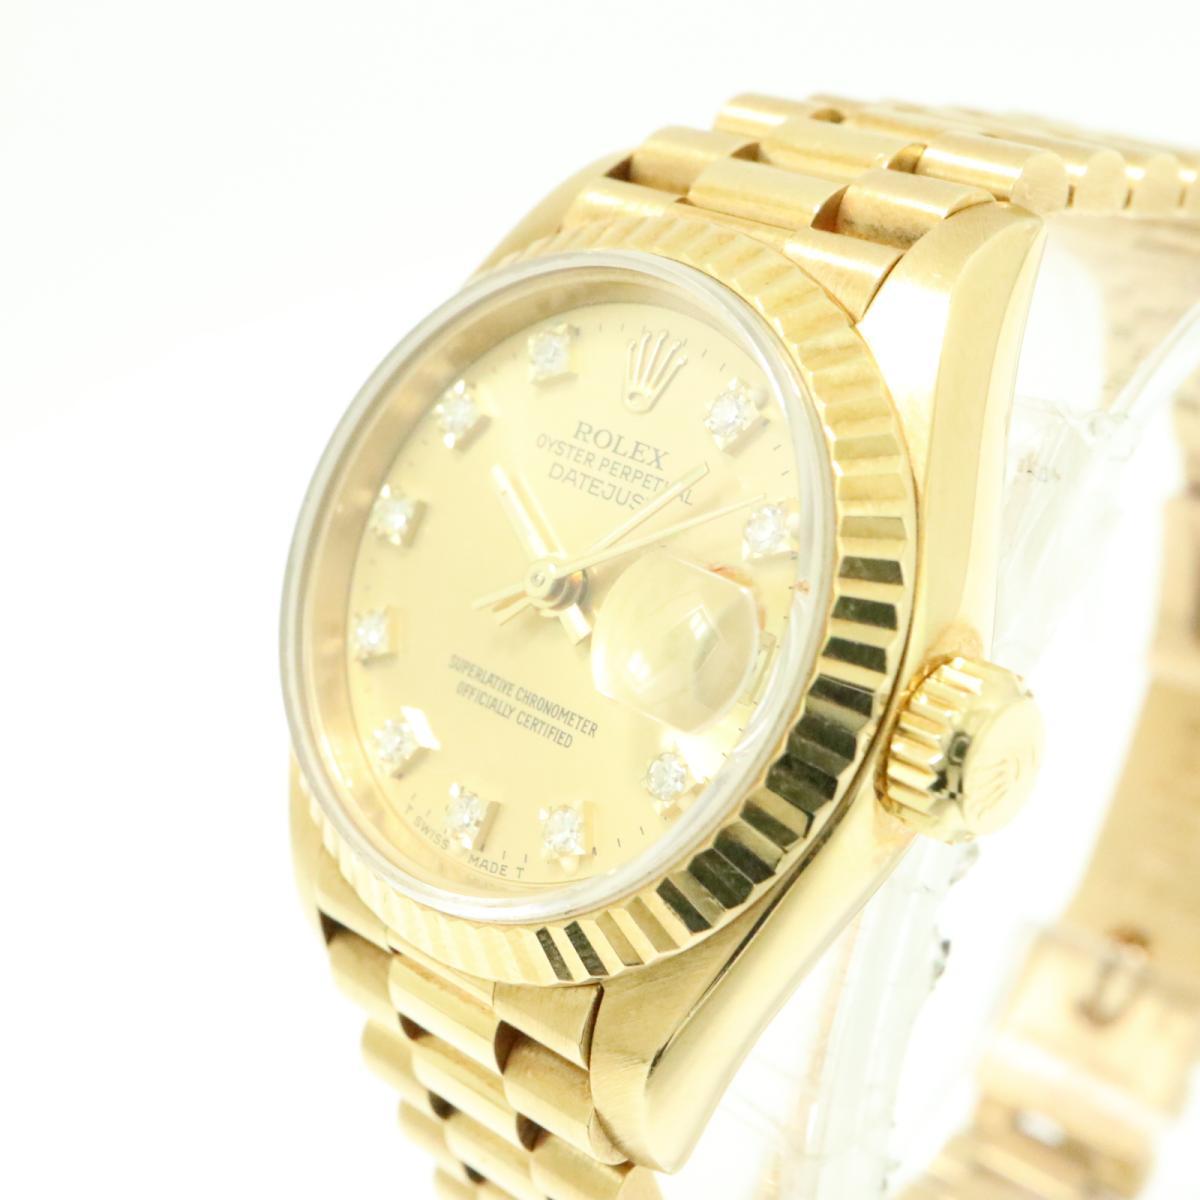 ROLEX 時計 69178G デイトジャスト ウォッチ 腕時計